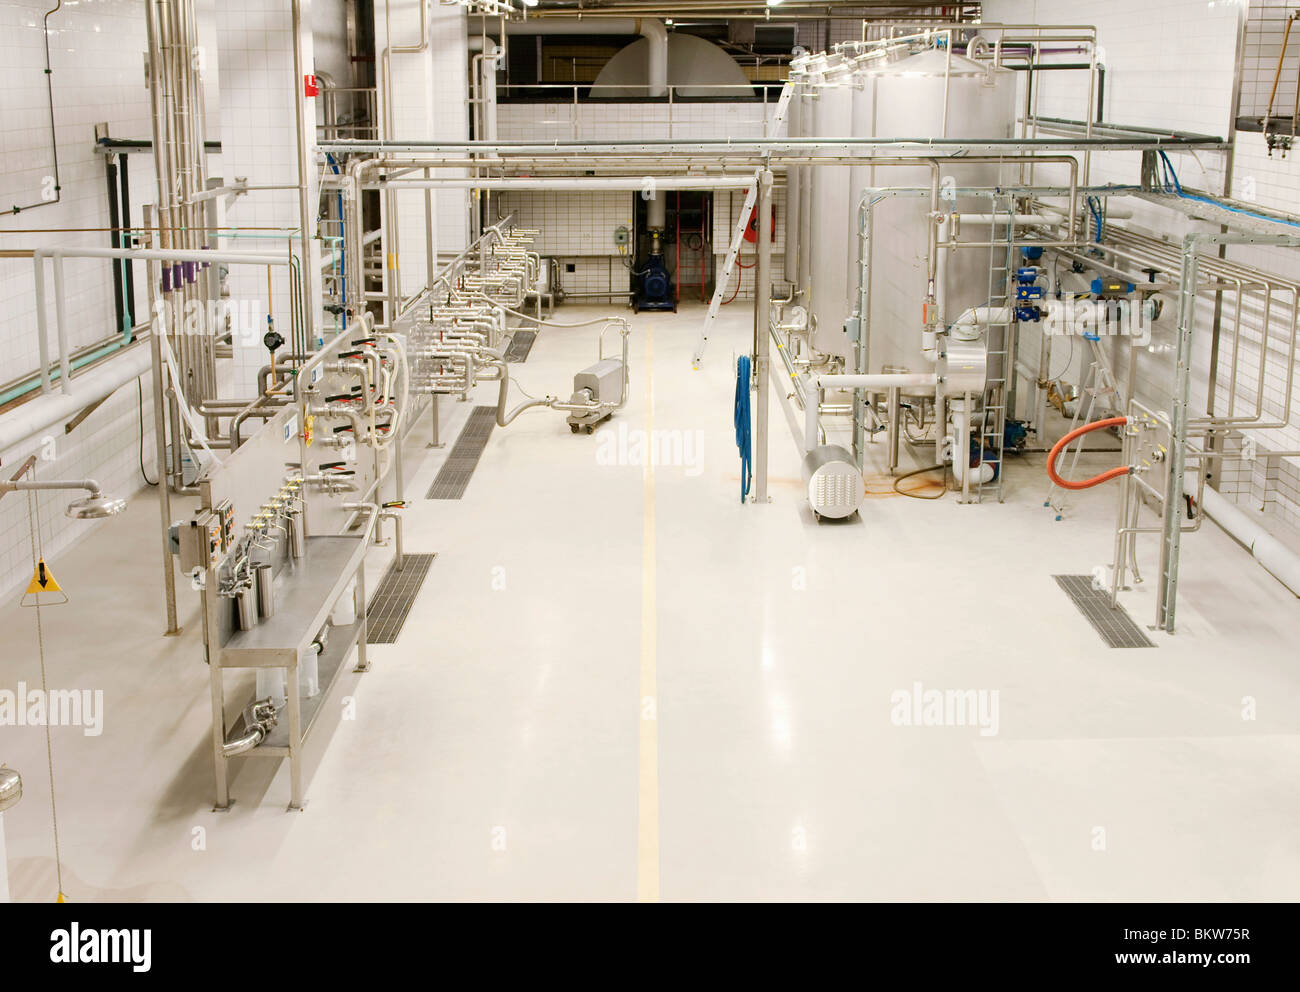 Sterile industrial premises - Stock Image